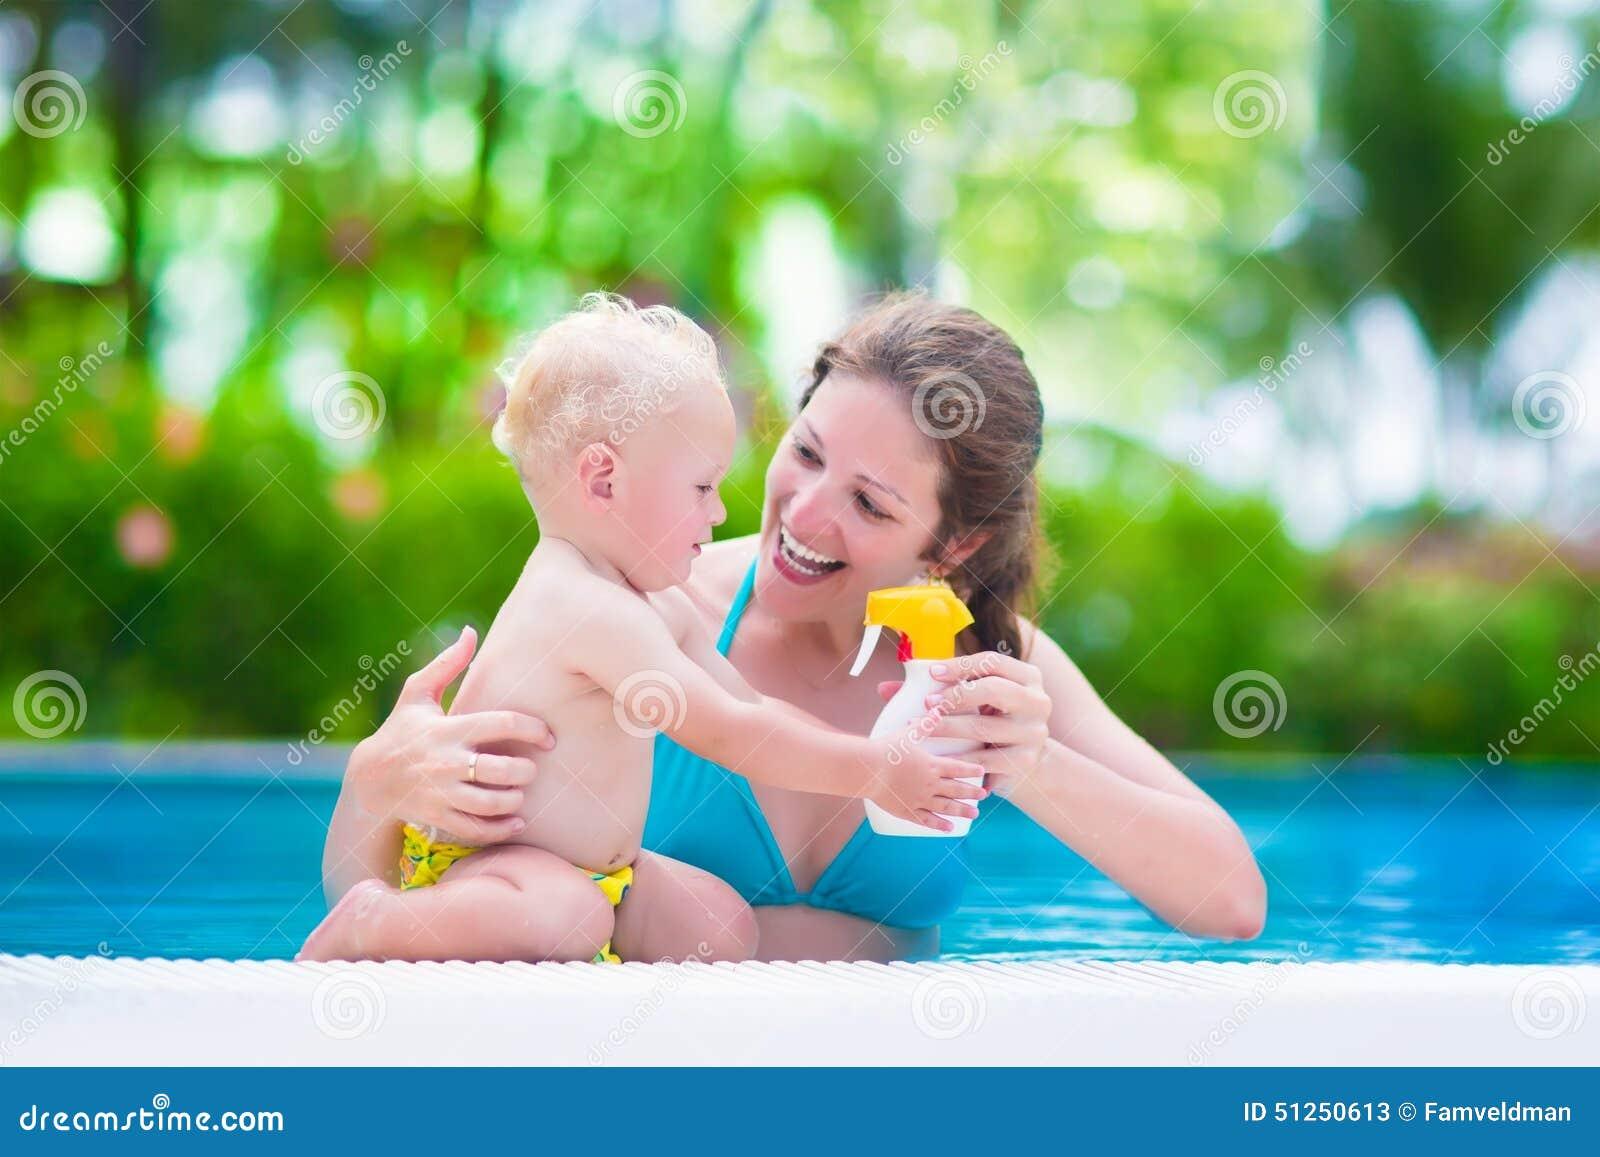 Boy enjoying summer vacation in a tropical resort at a swimming pool